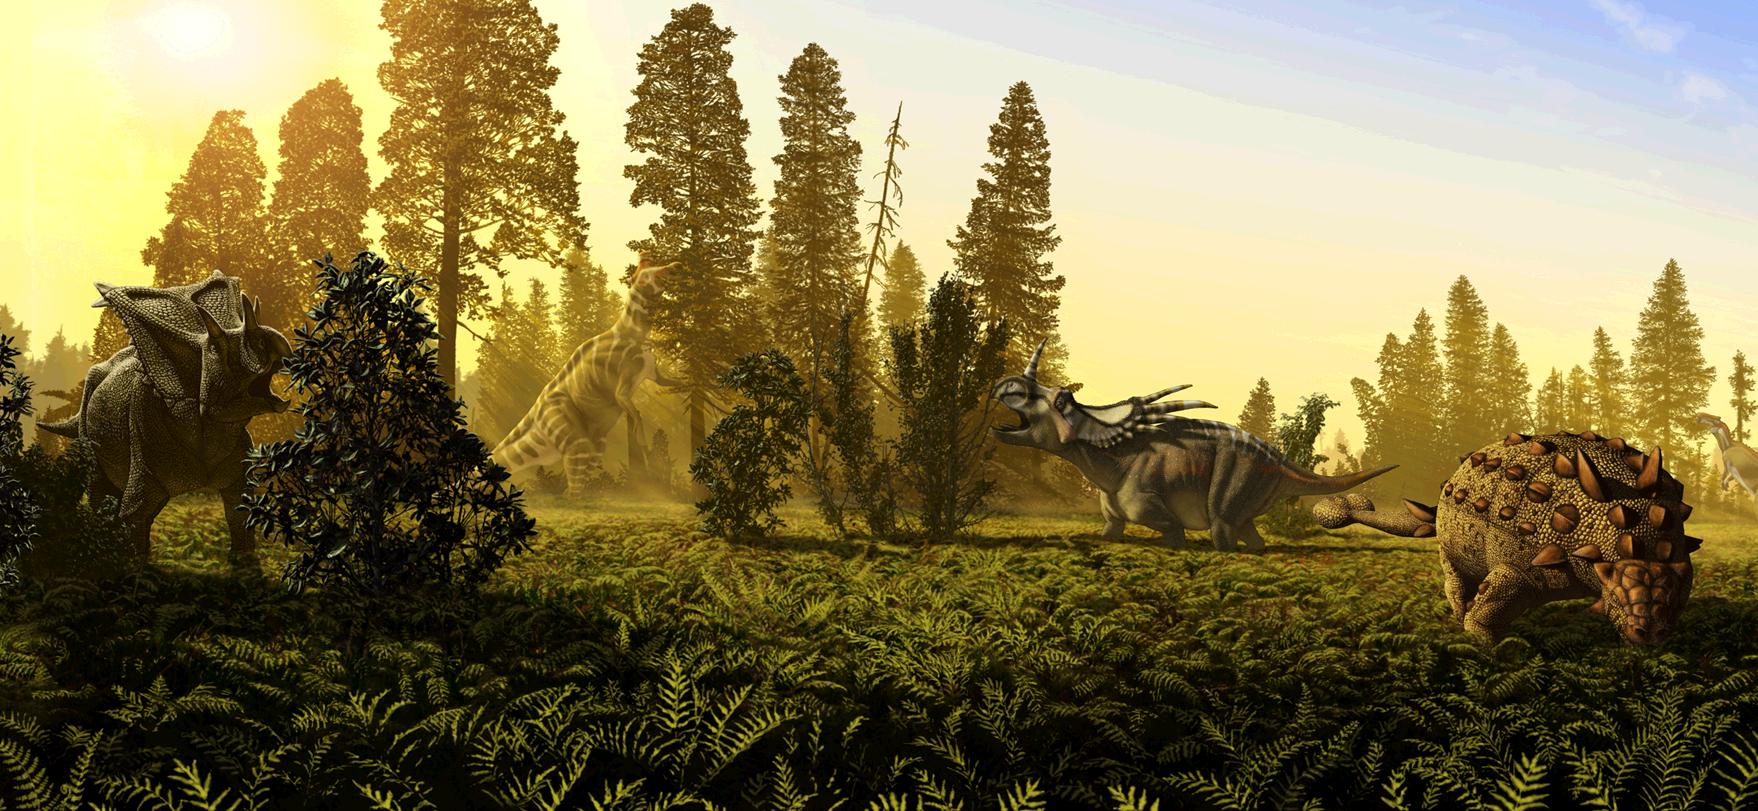 Cretaceous Wildlife